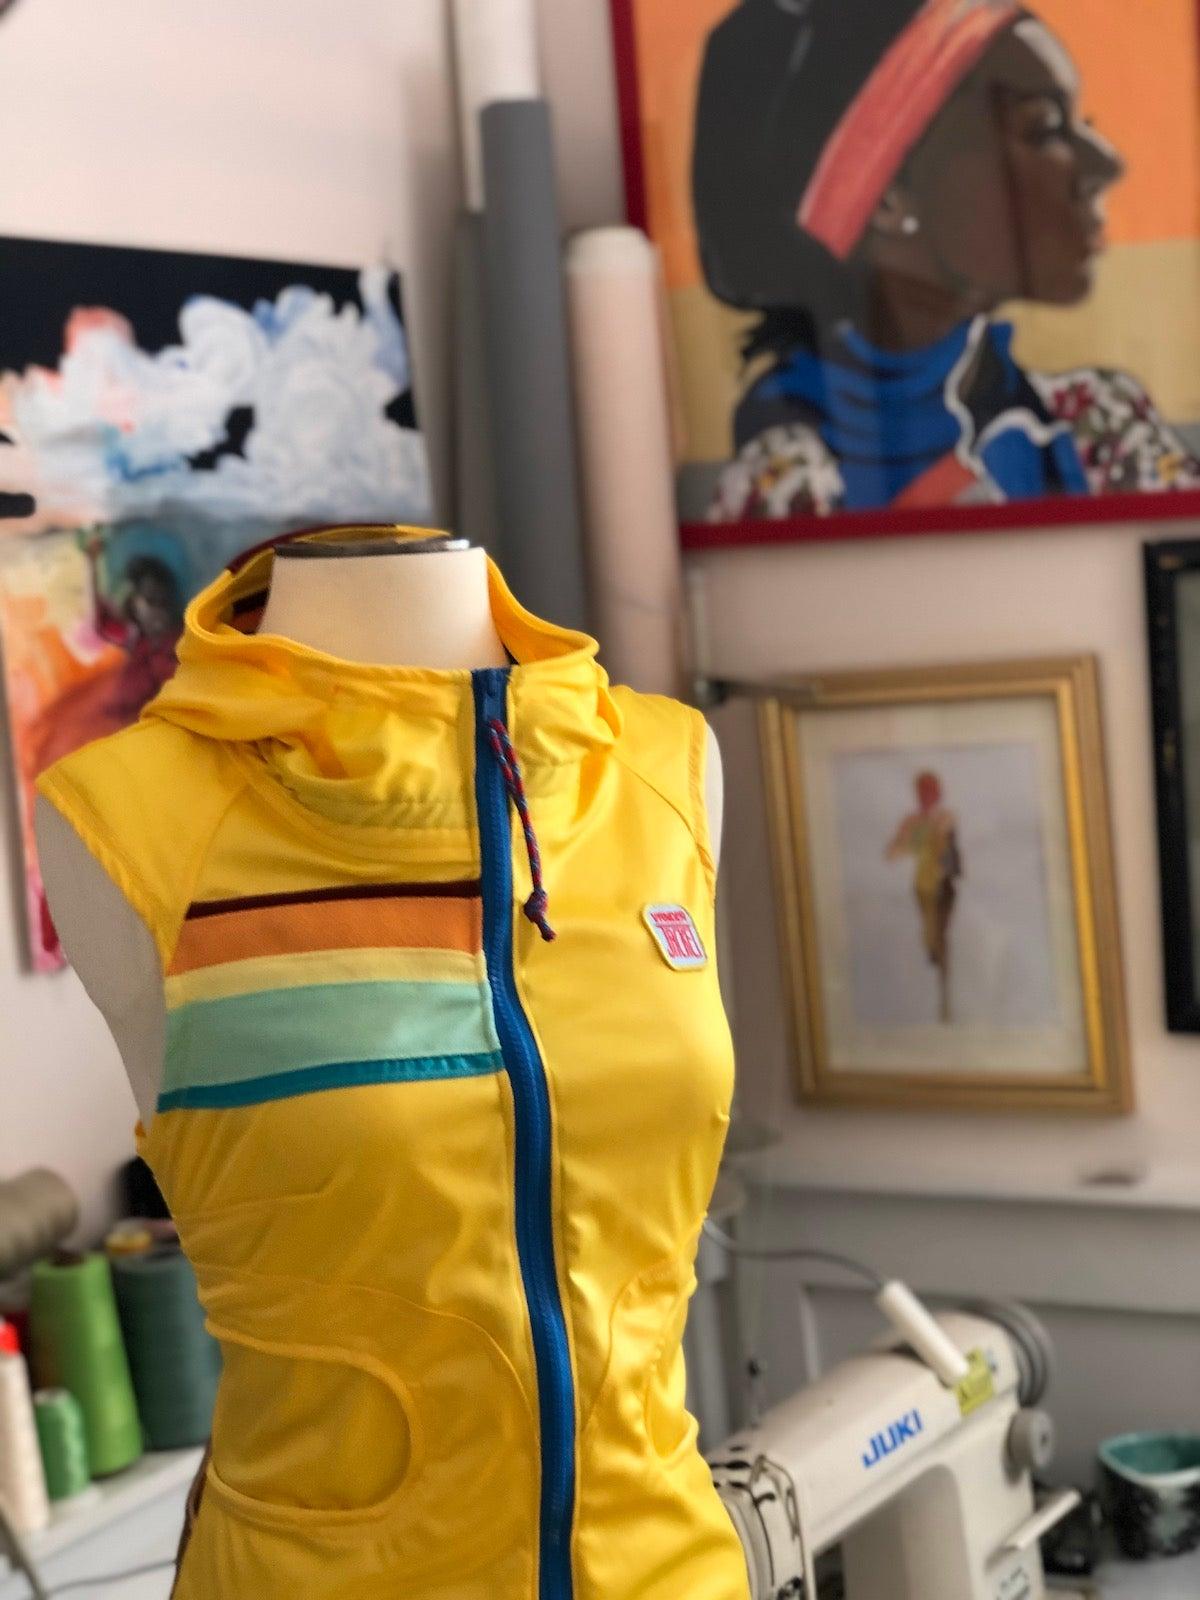 Custom garment, a sleeveless jacket